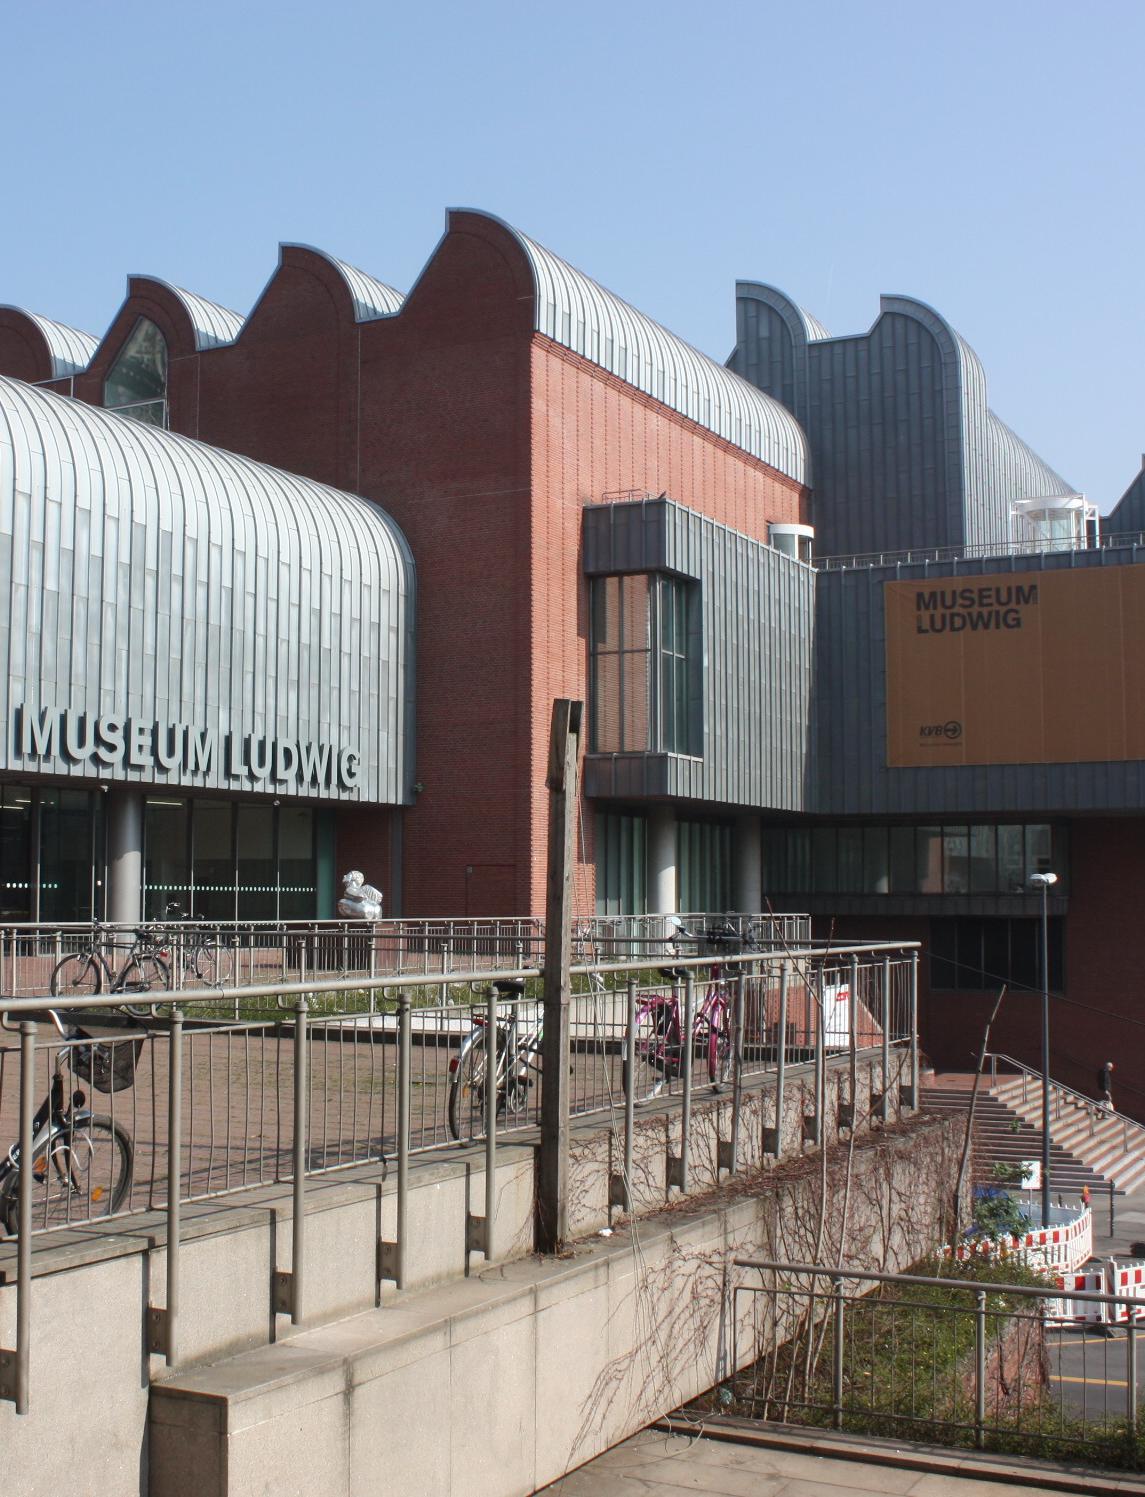 Moderne Architektur vom Kölner Museum Ludwig